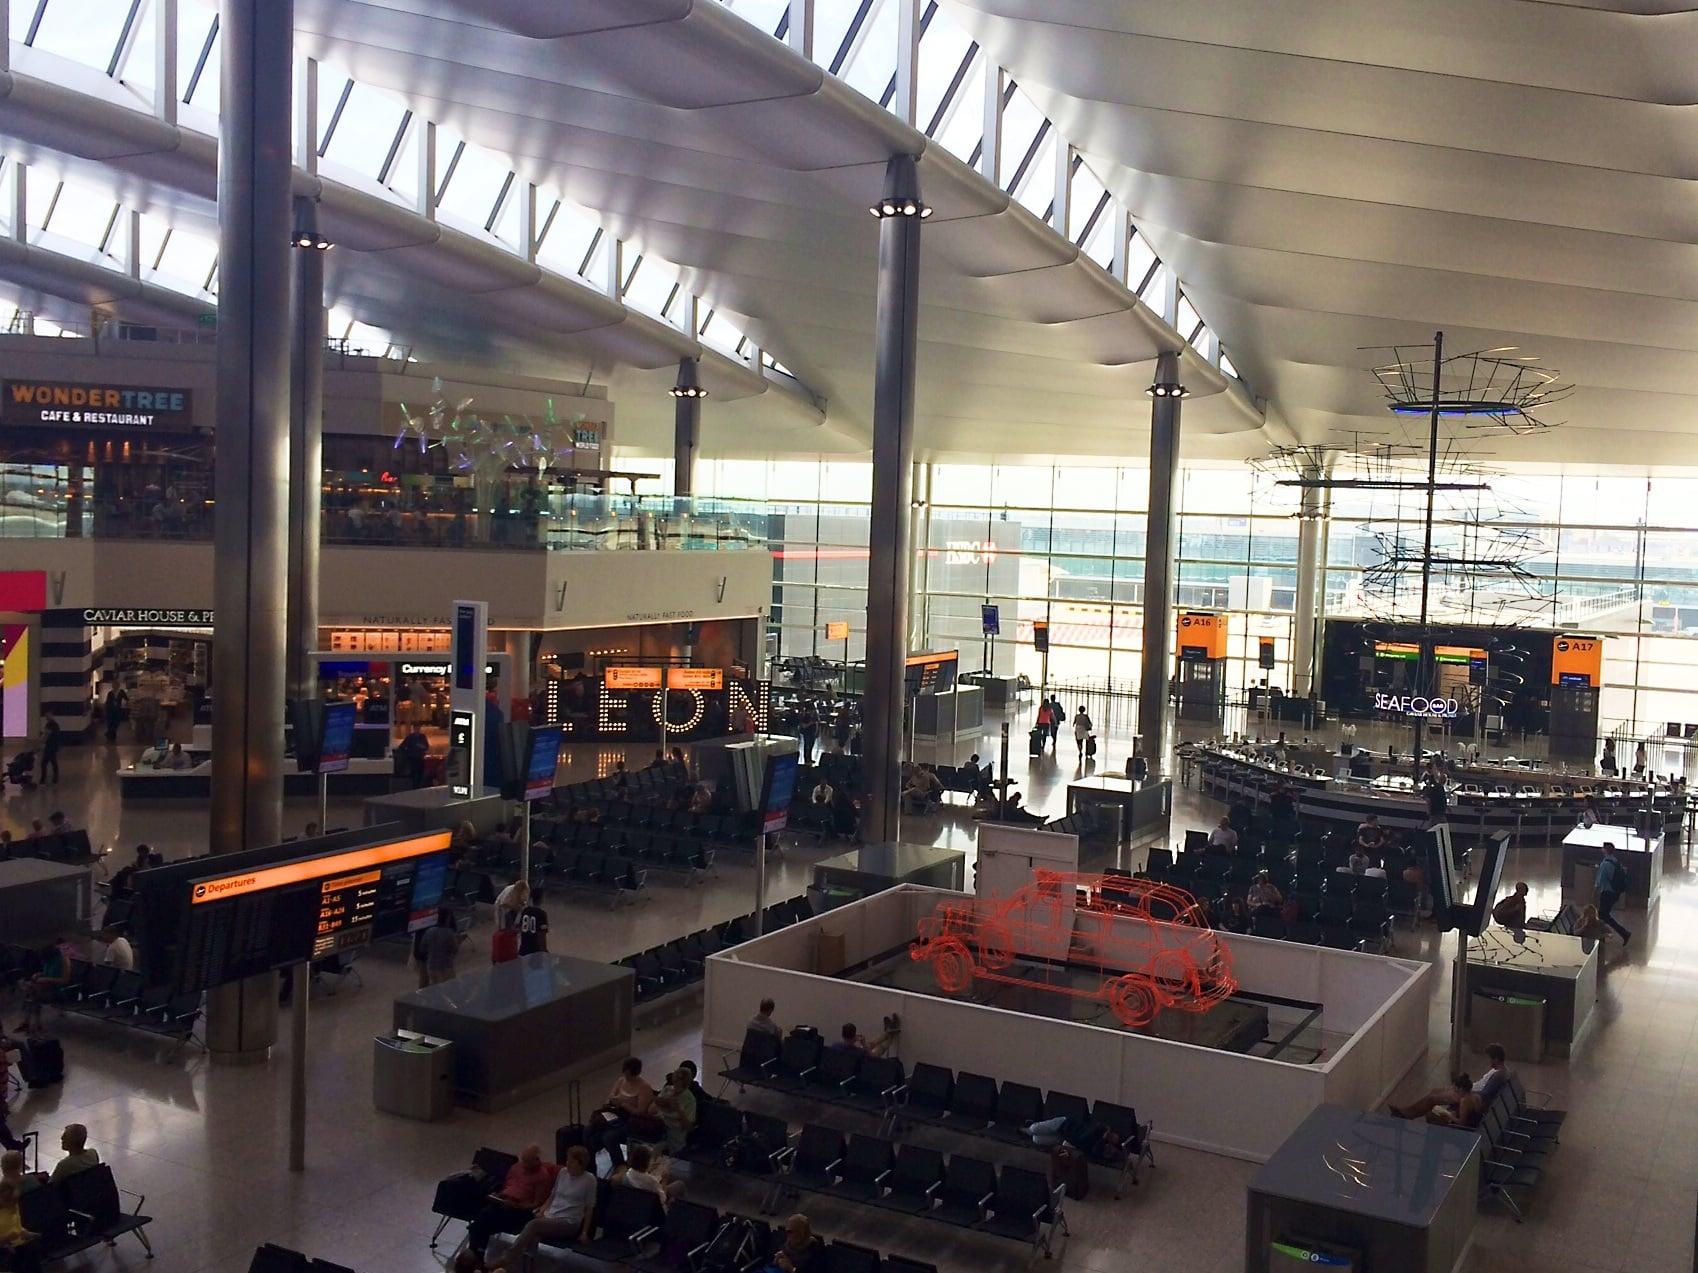 Departures at Heathrow Terminal 2